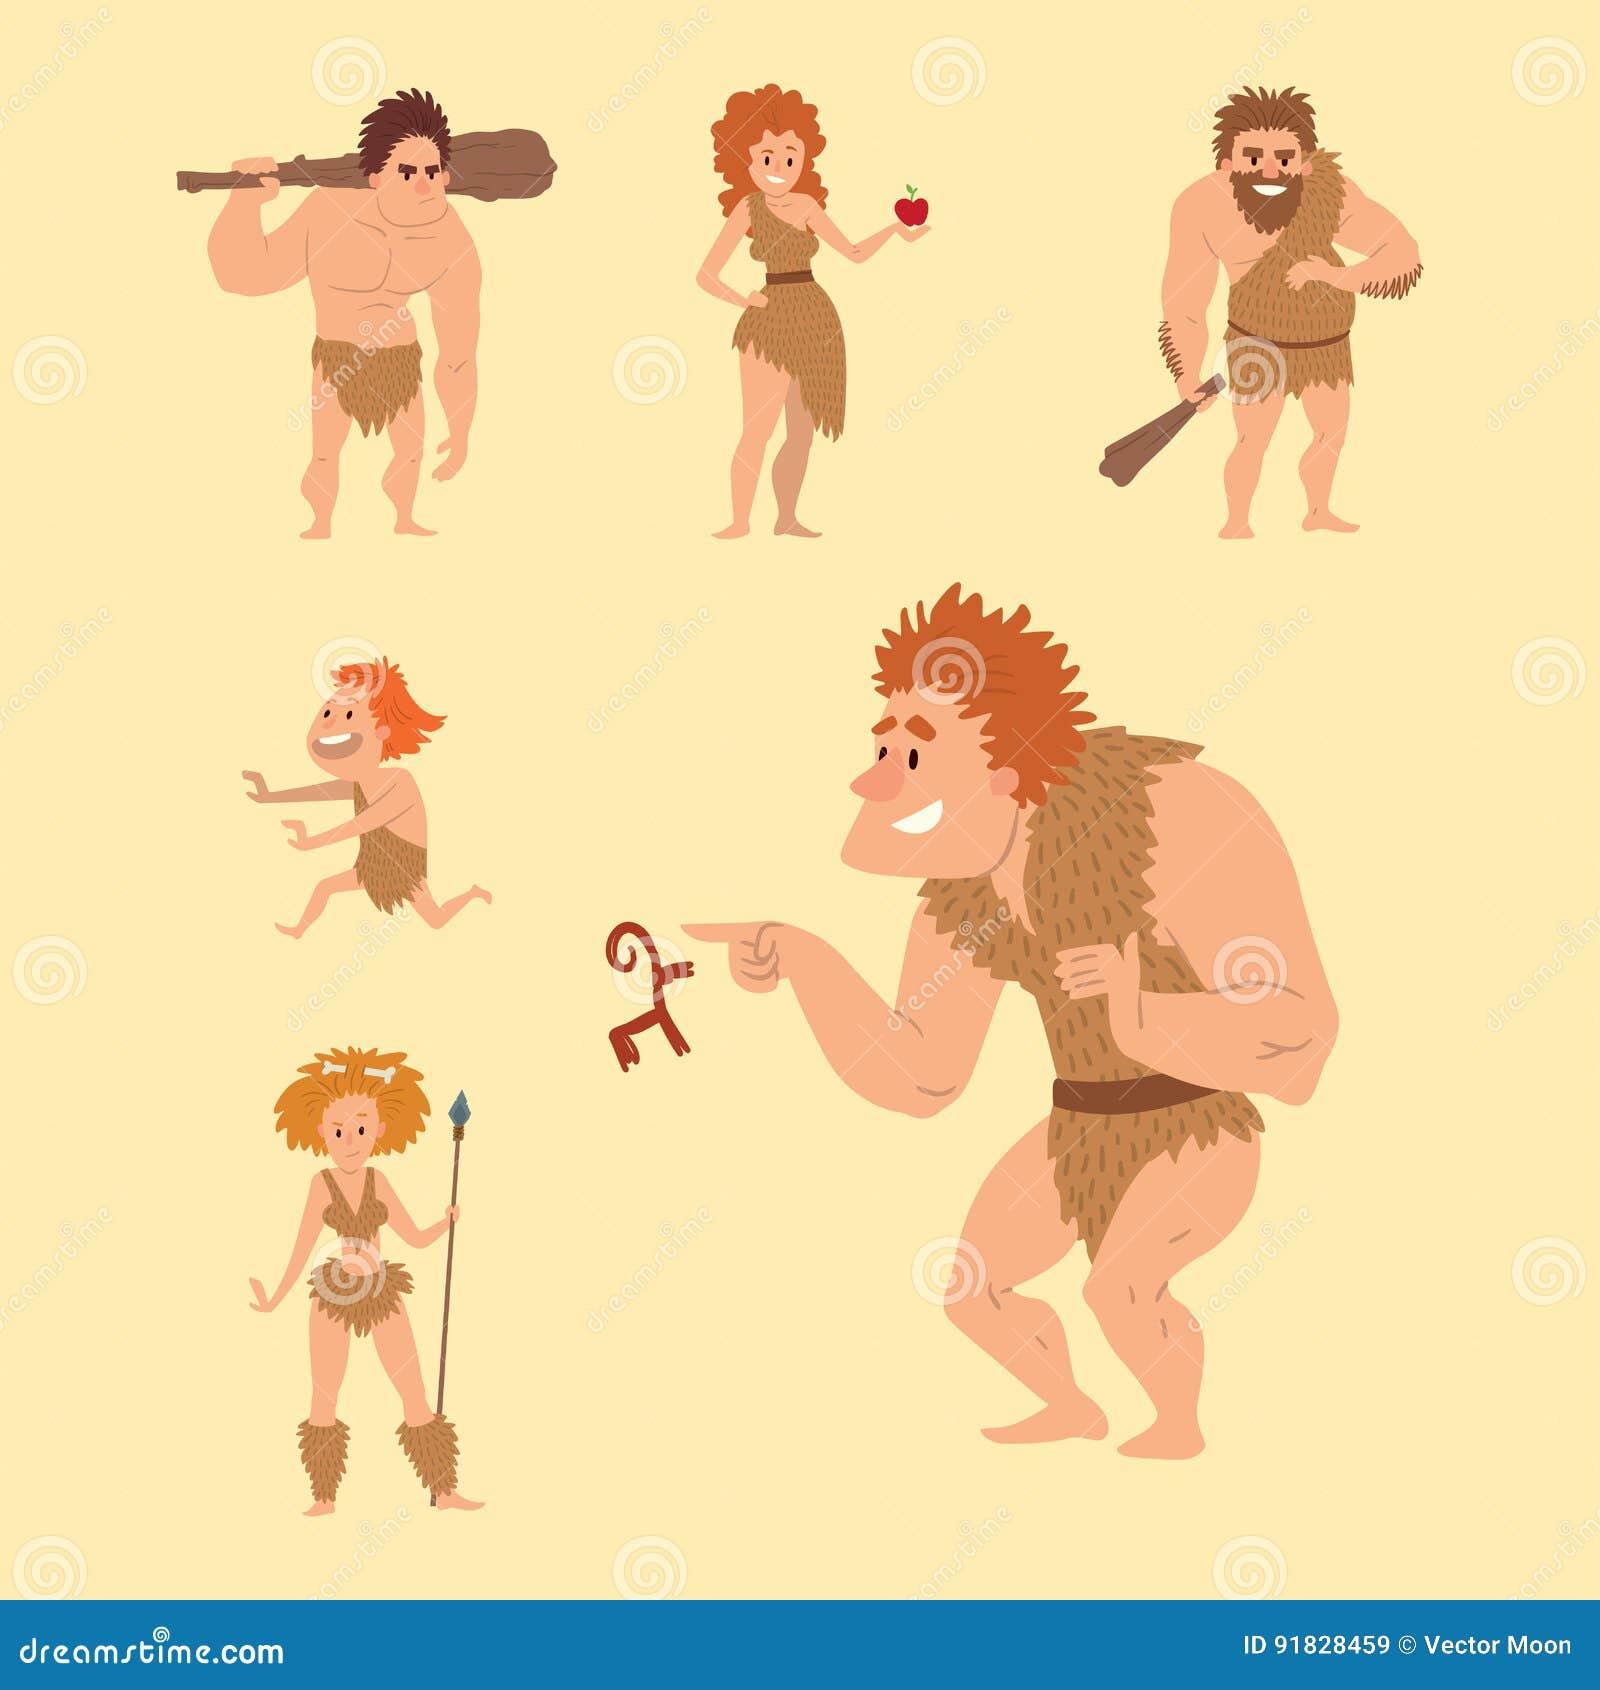 caveman primitive stone age cartoon neanderthal people character